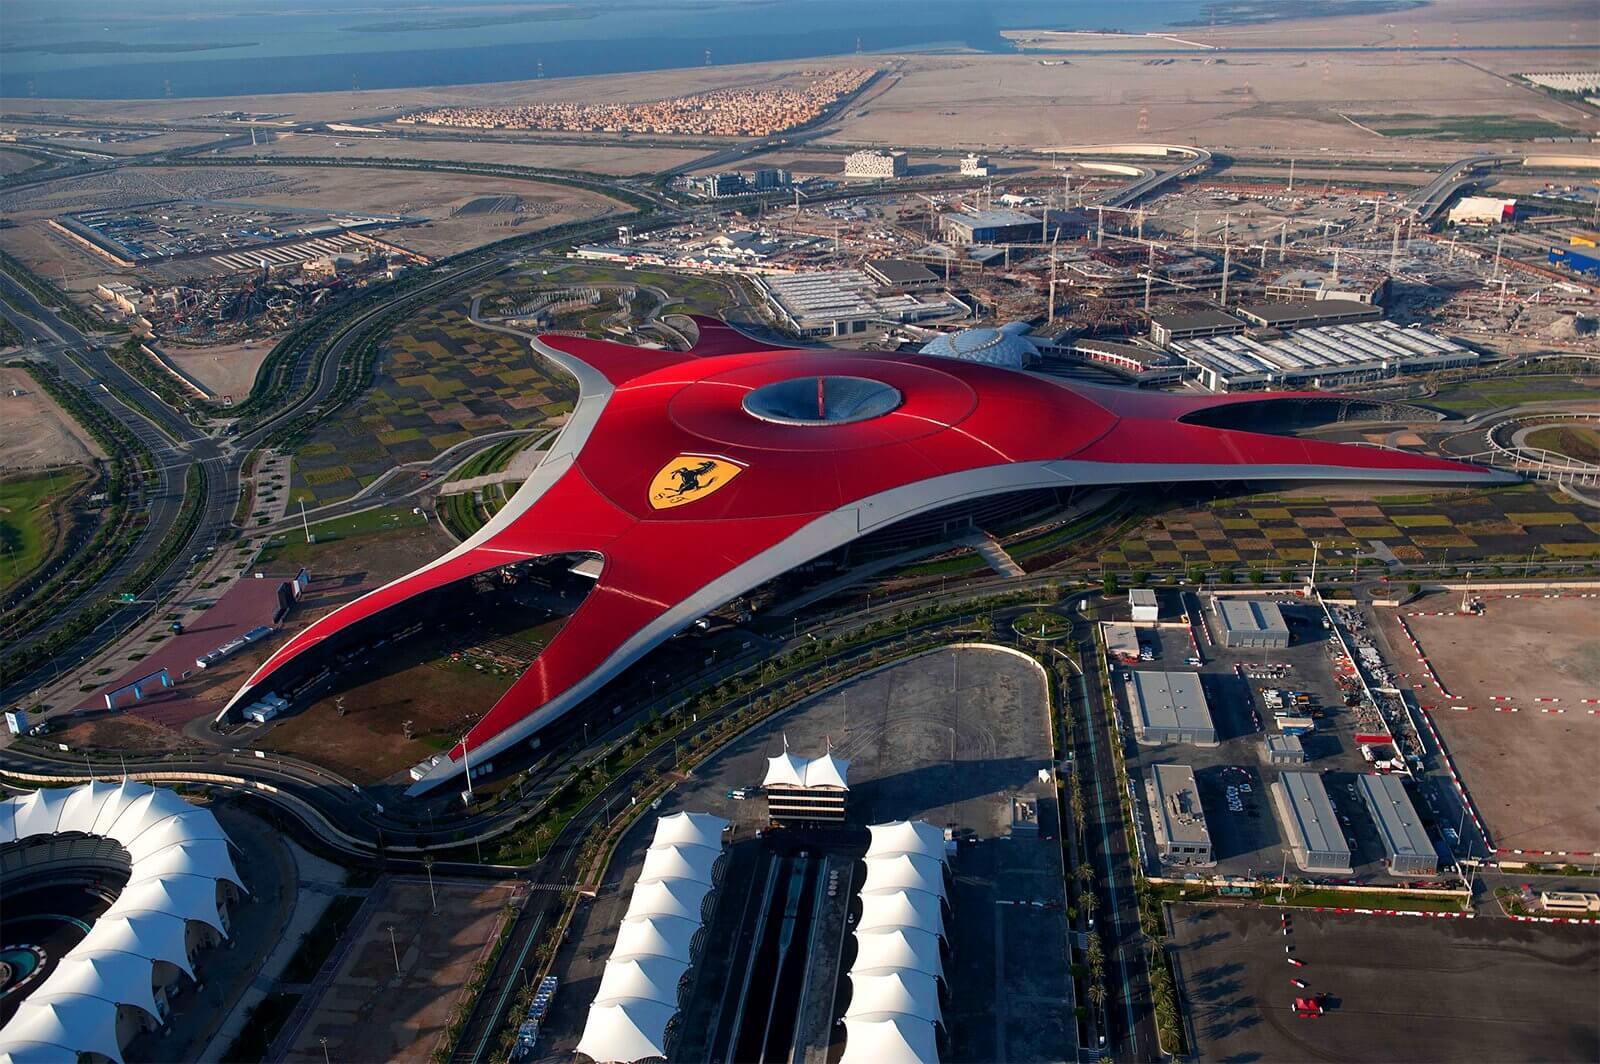 Парк развлечений Ferrari World